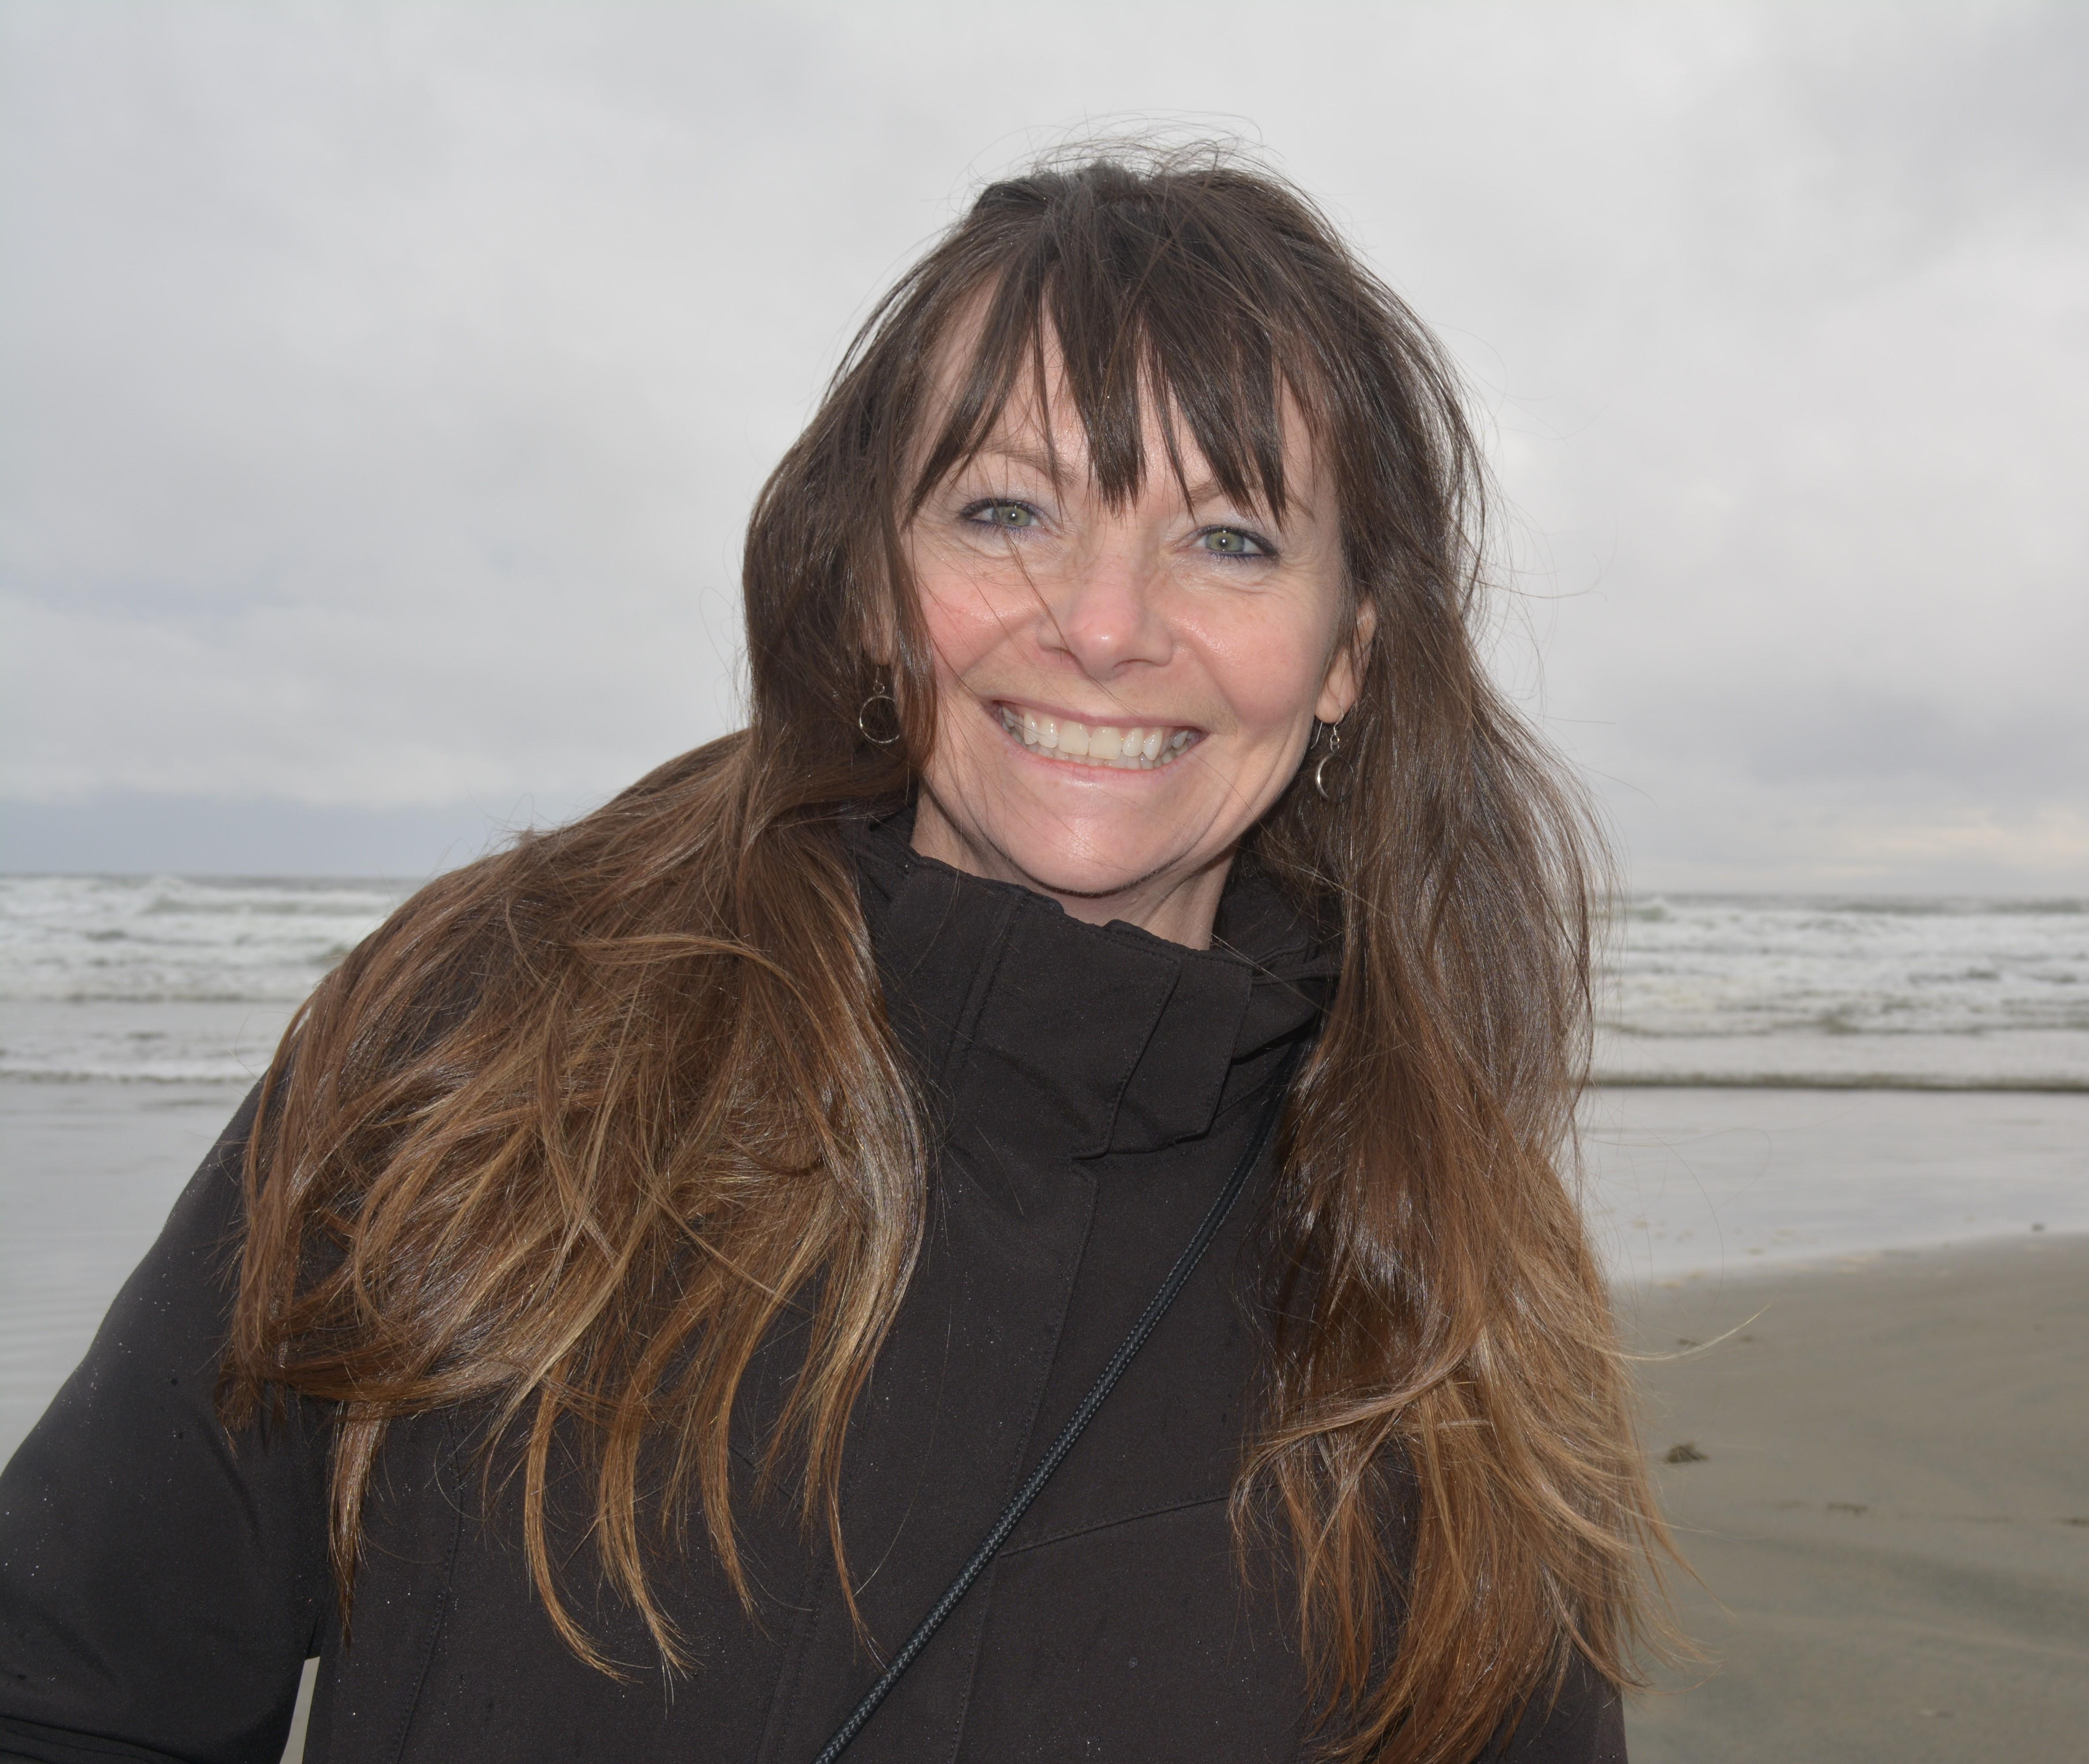 Ecklundson Construction Controller Leanne Chetcuti